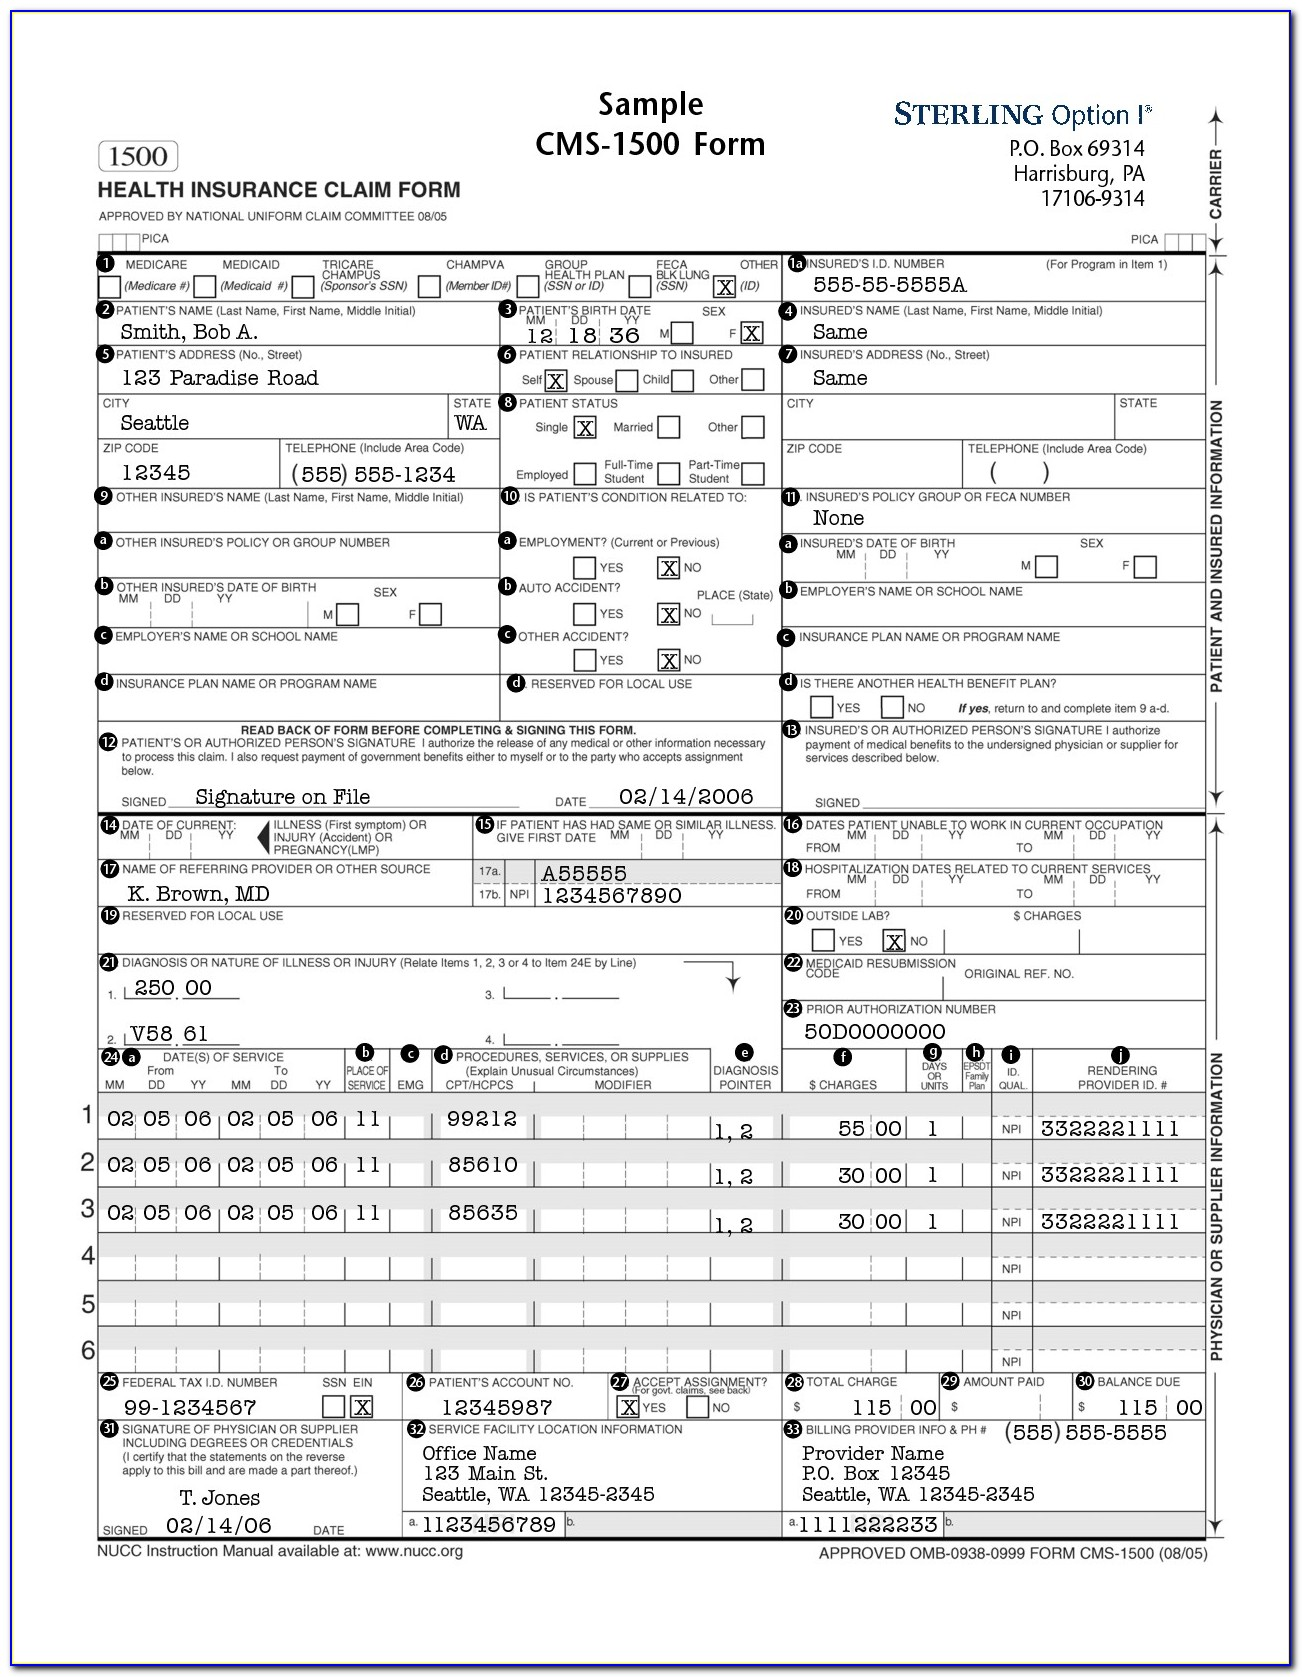 Health Insurance Claim Form Cms 1500